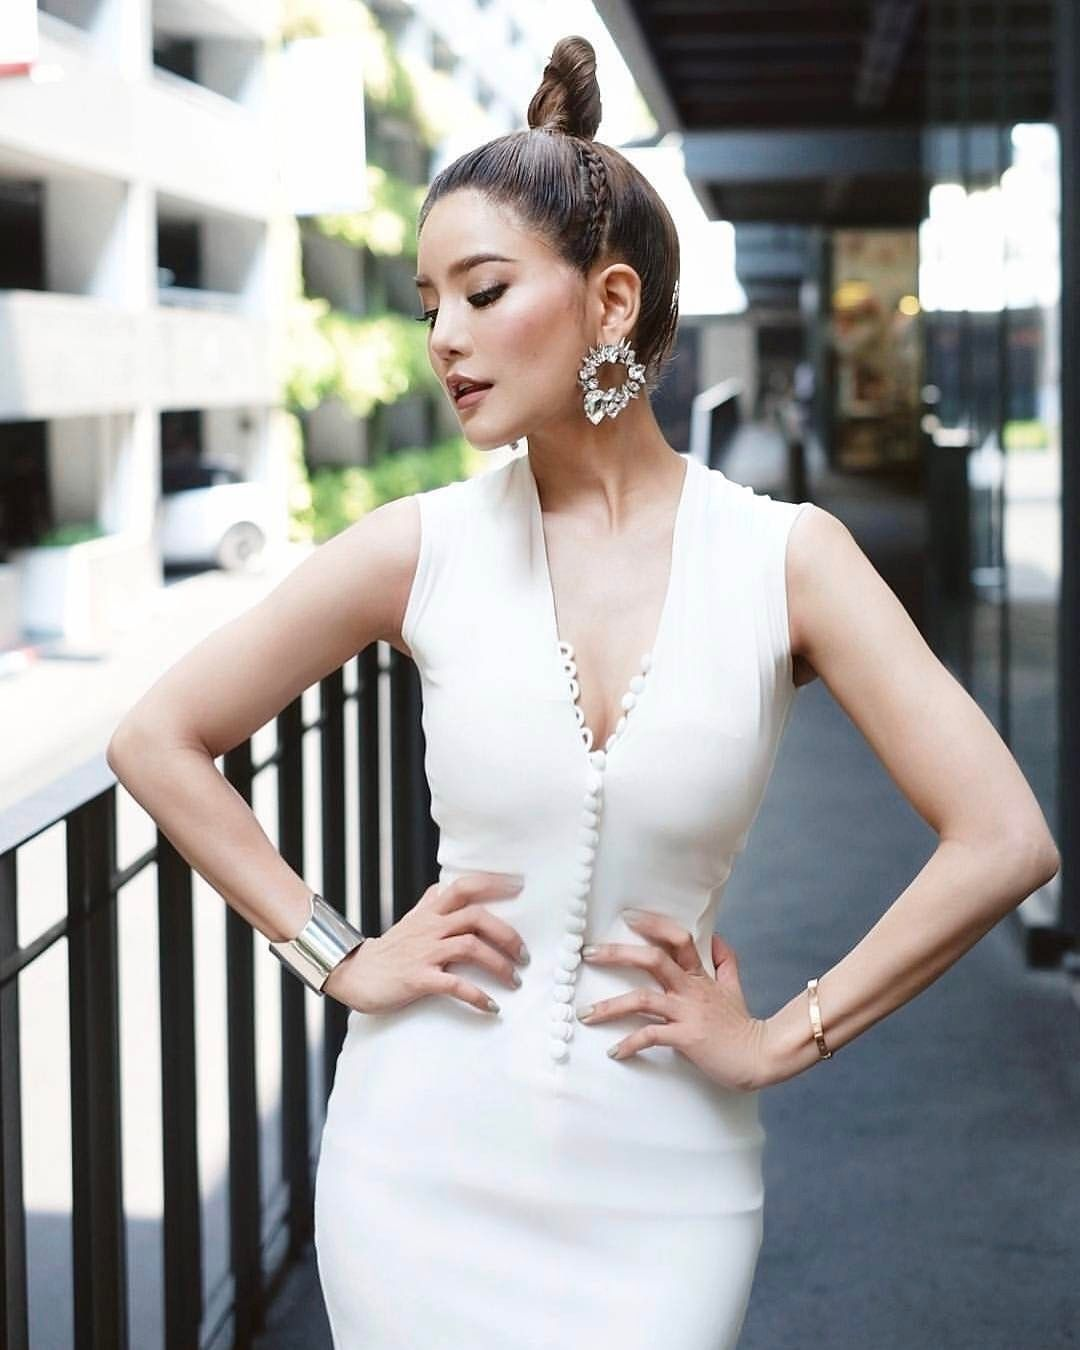 Secret World Of Glamour Poem Official On Instagram Khun Rachwinwong In